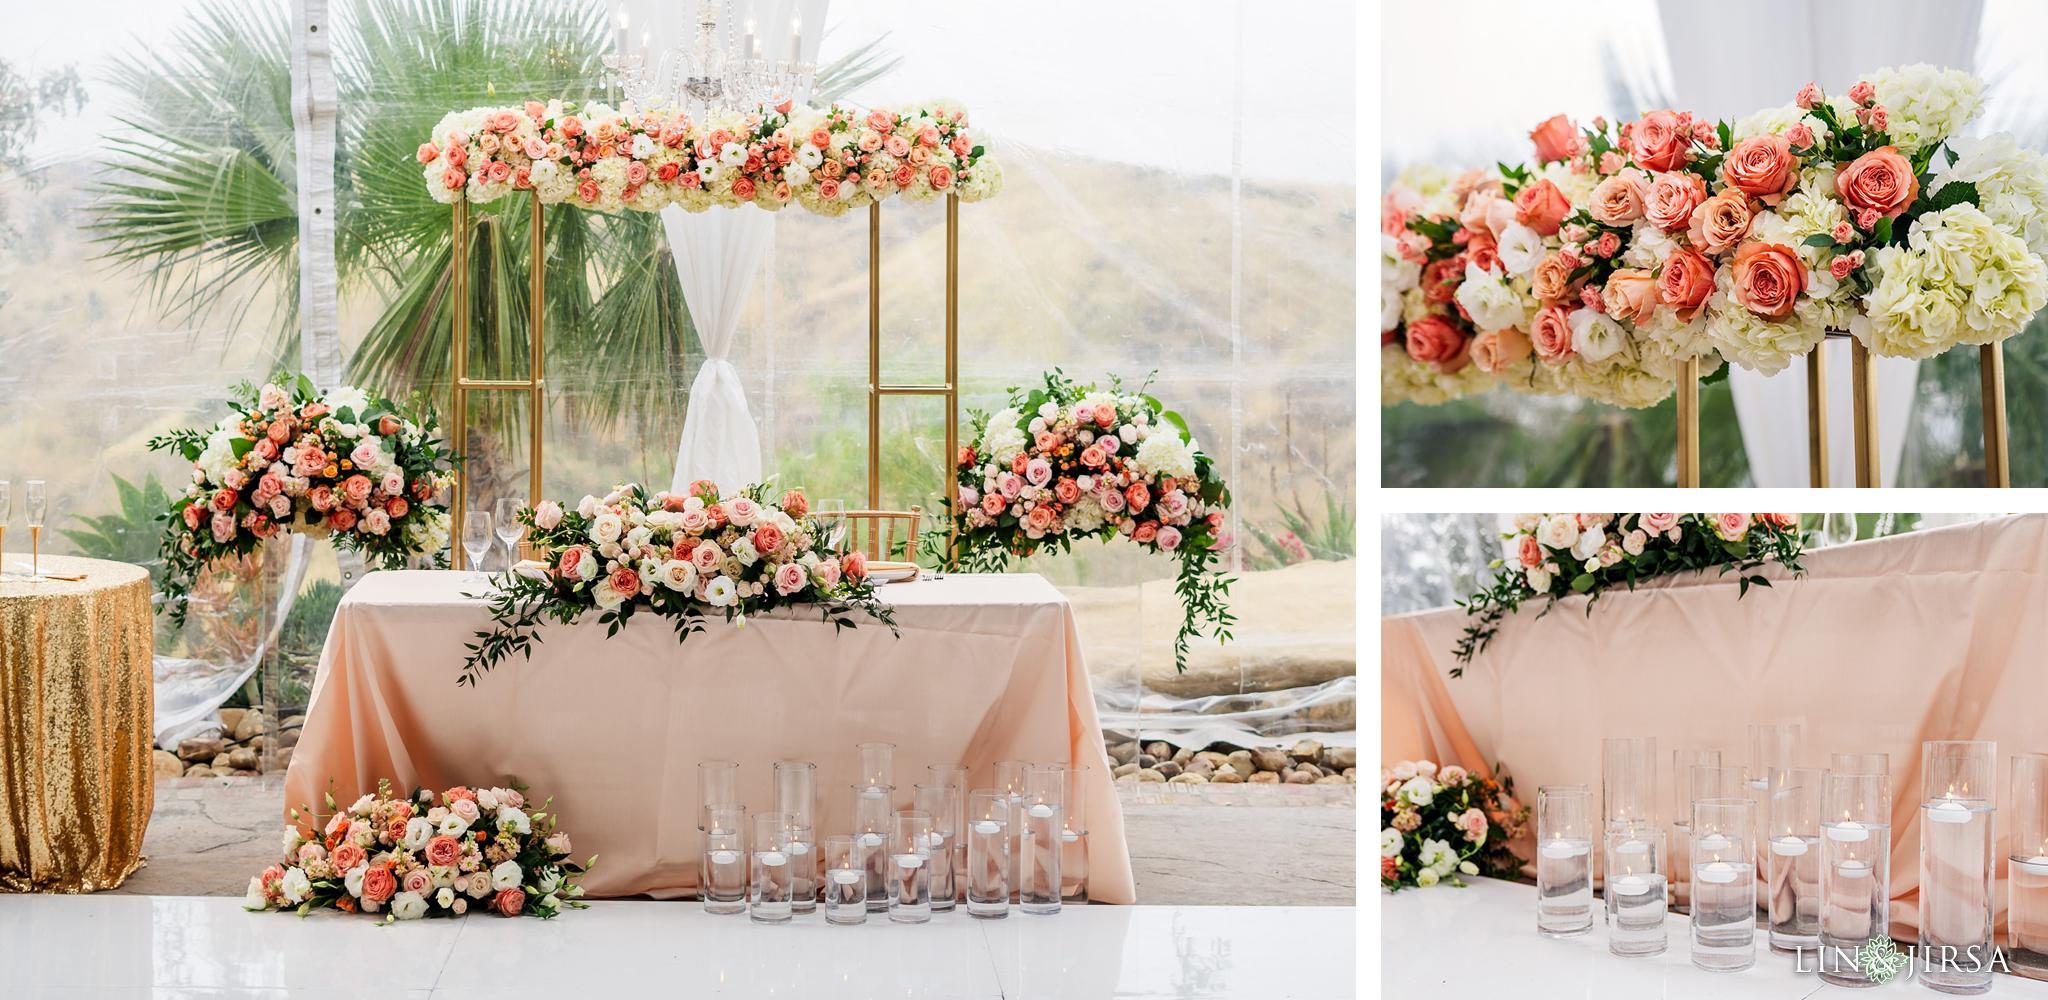 31 Hummingbird Nest Ranch Santa Susana Wedding Photography